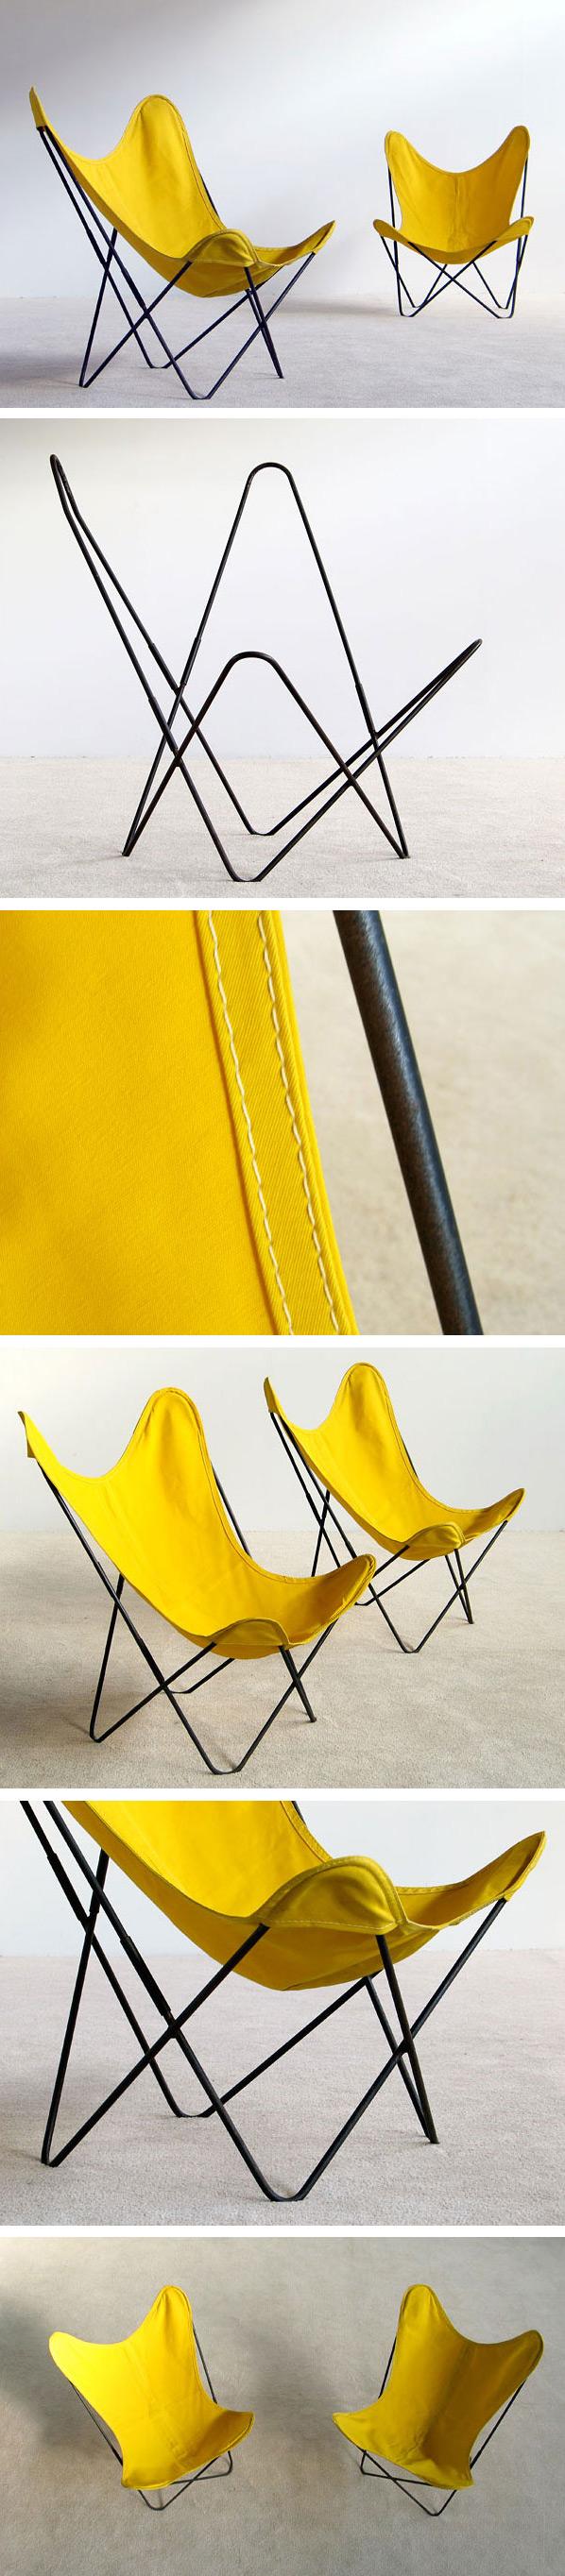 Pair of Jorge Ferrai Hardoy lounge chairs Large